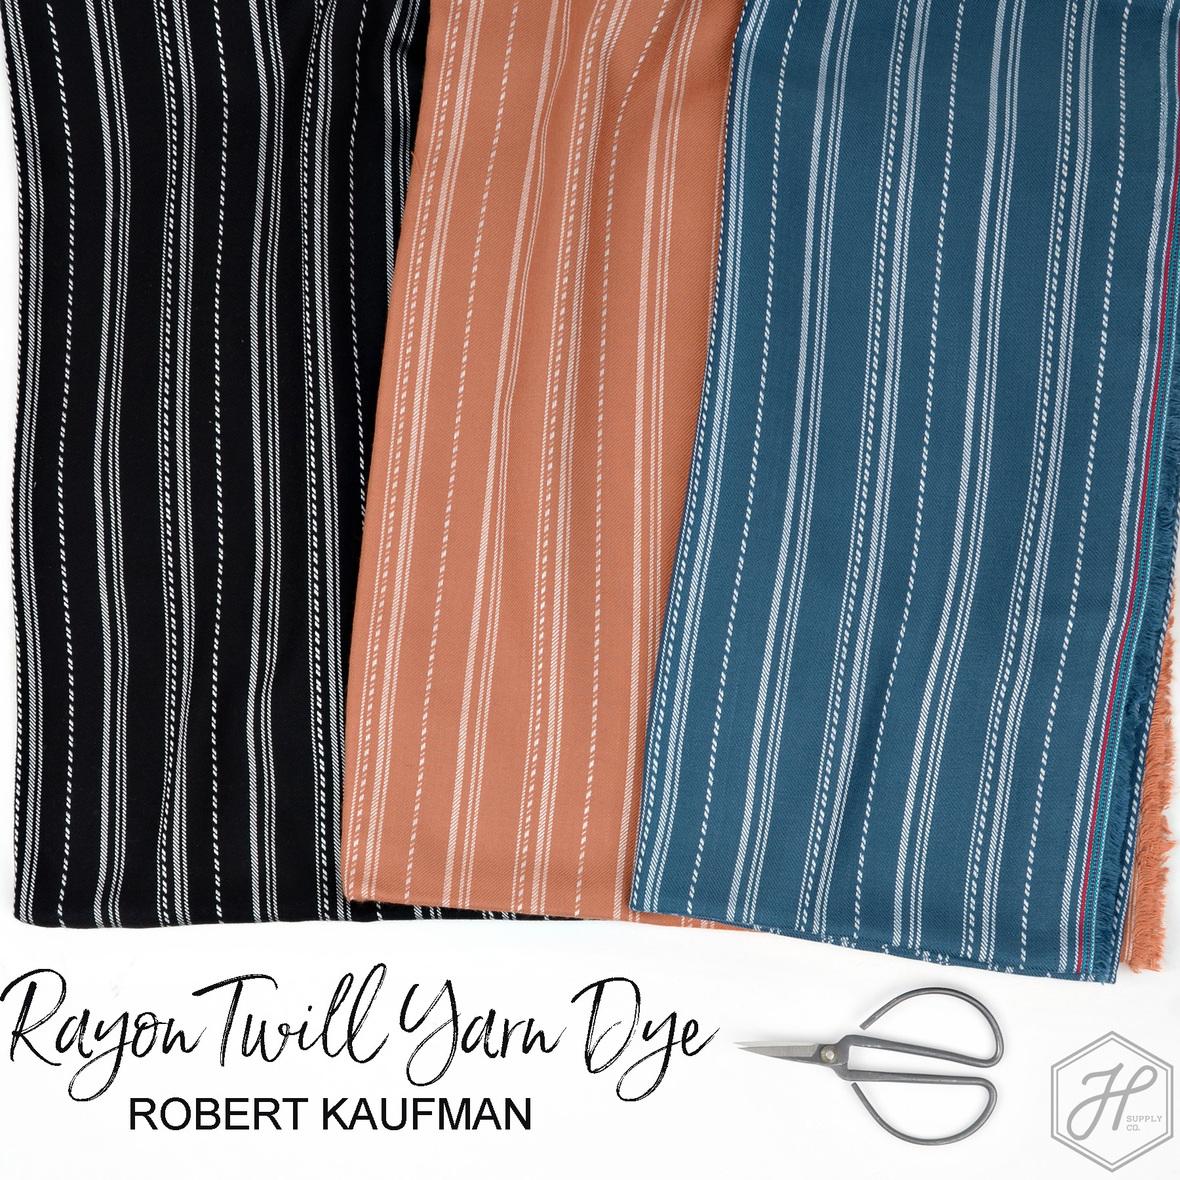 Rayon Twill Yarn Dye Robert Kaufman at Hawthorne Supply Co